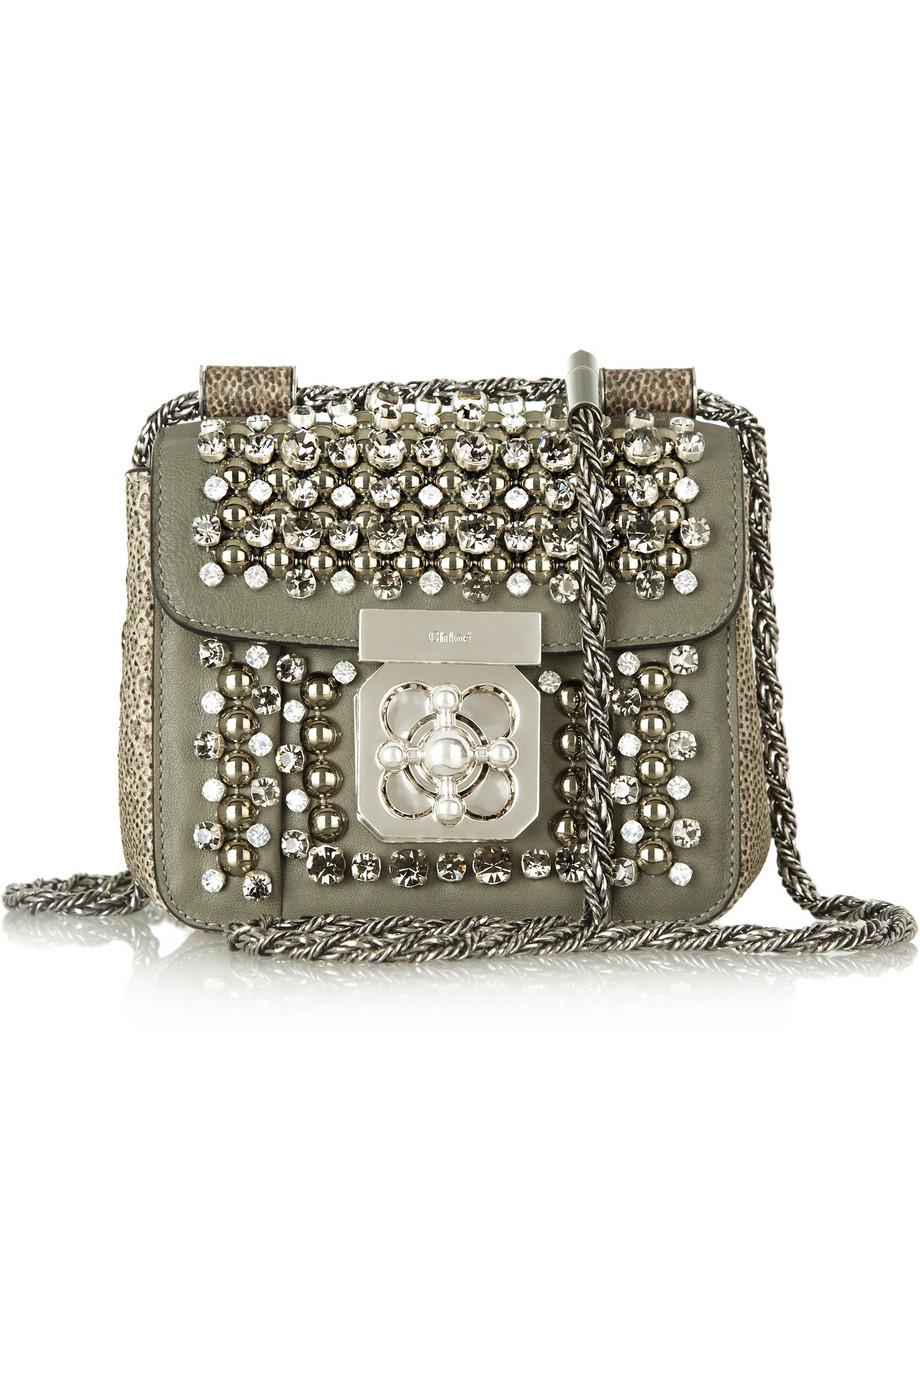 Chloé Handbags, Purses & Wallets | Nordstrom